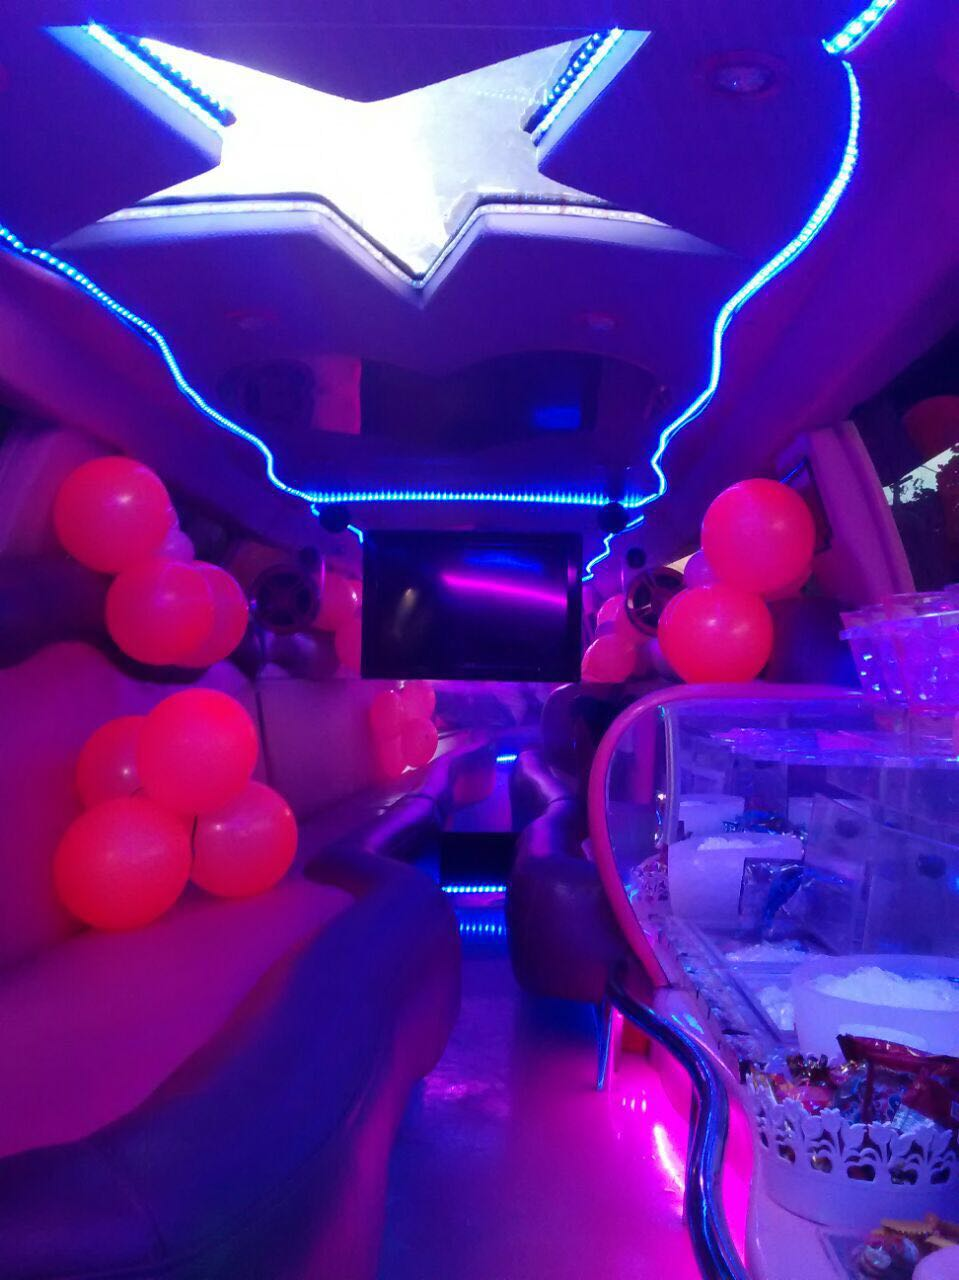 limo-fantasy24